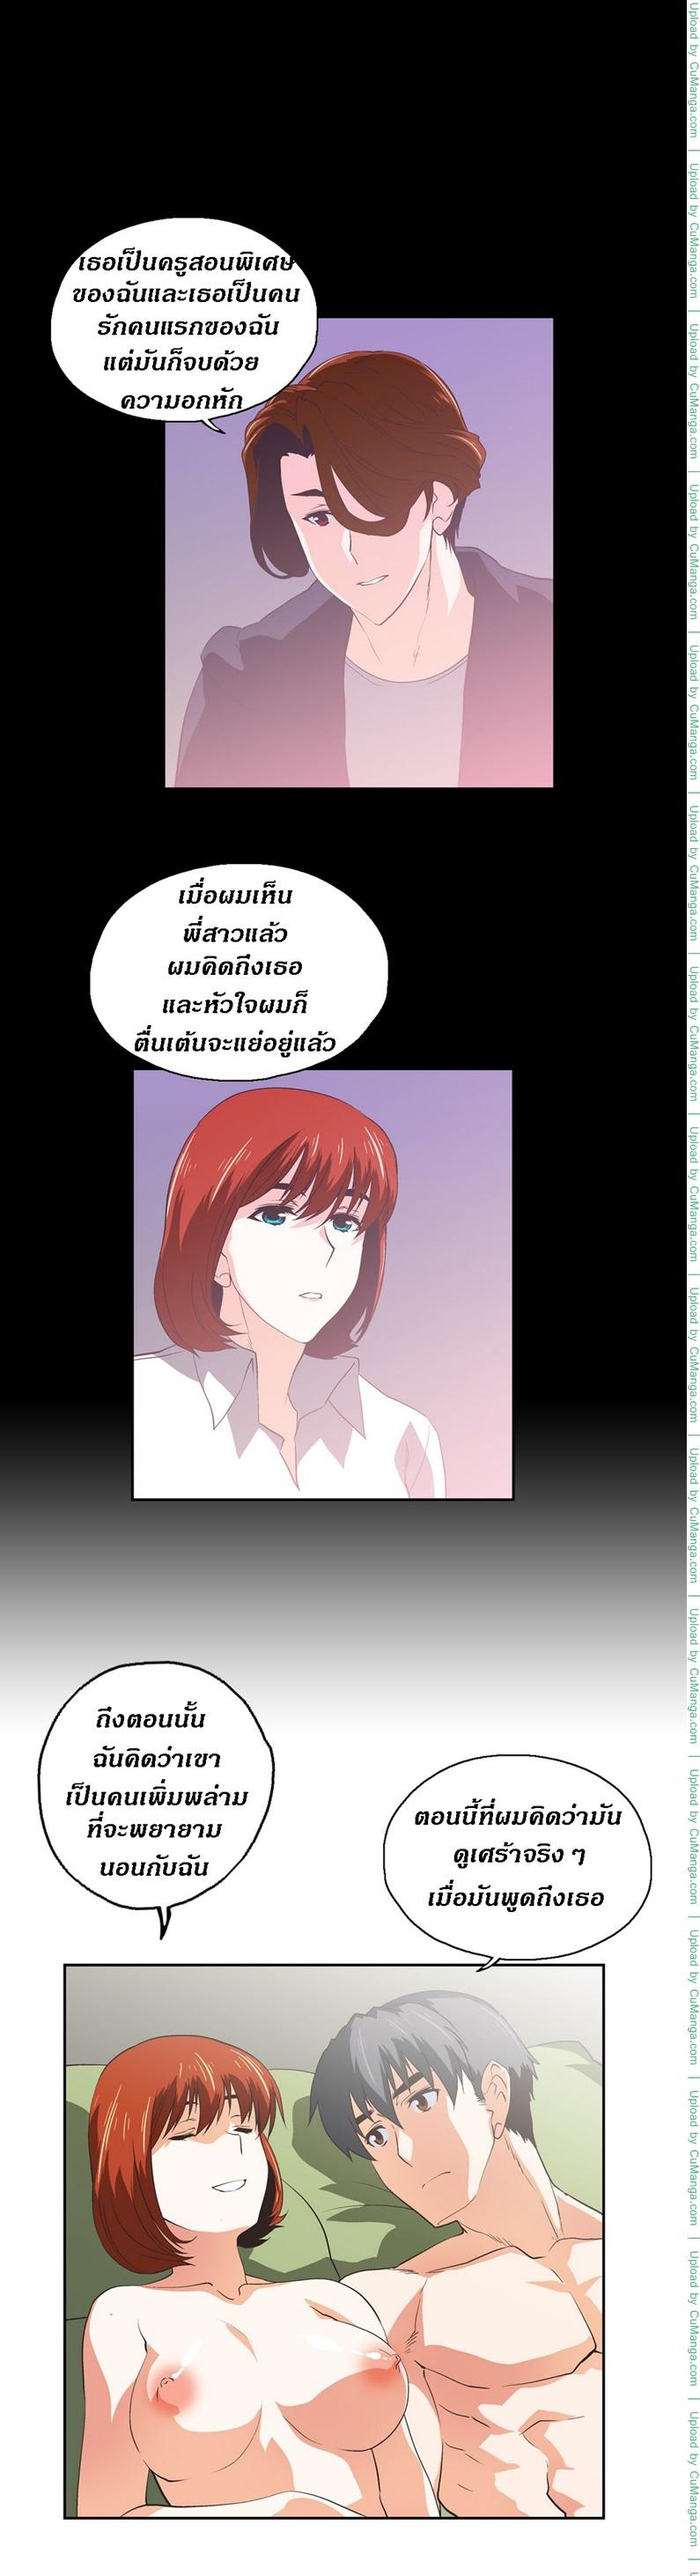 SStudy 44 - หน้า 27